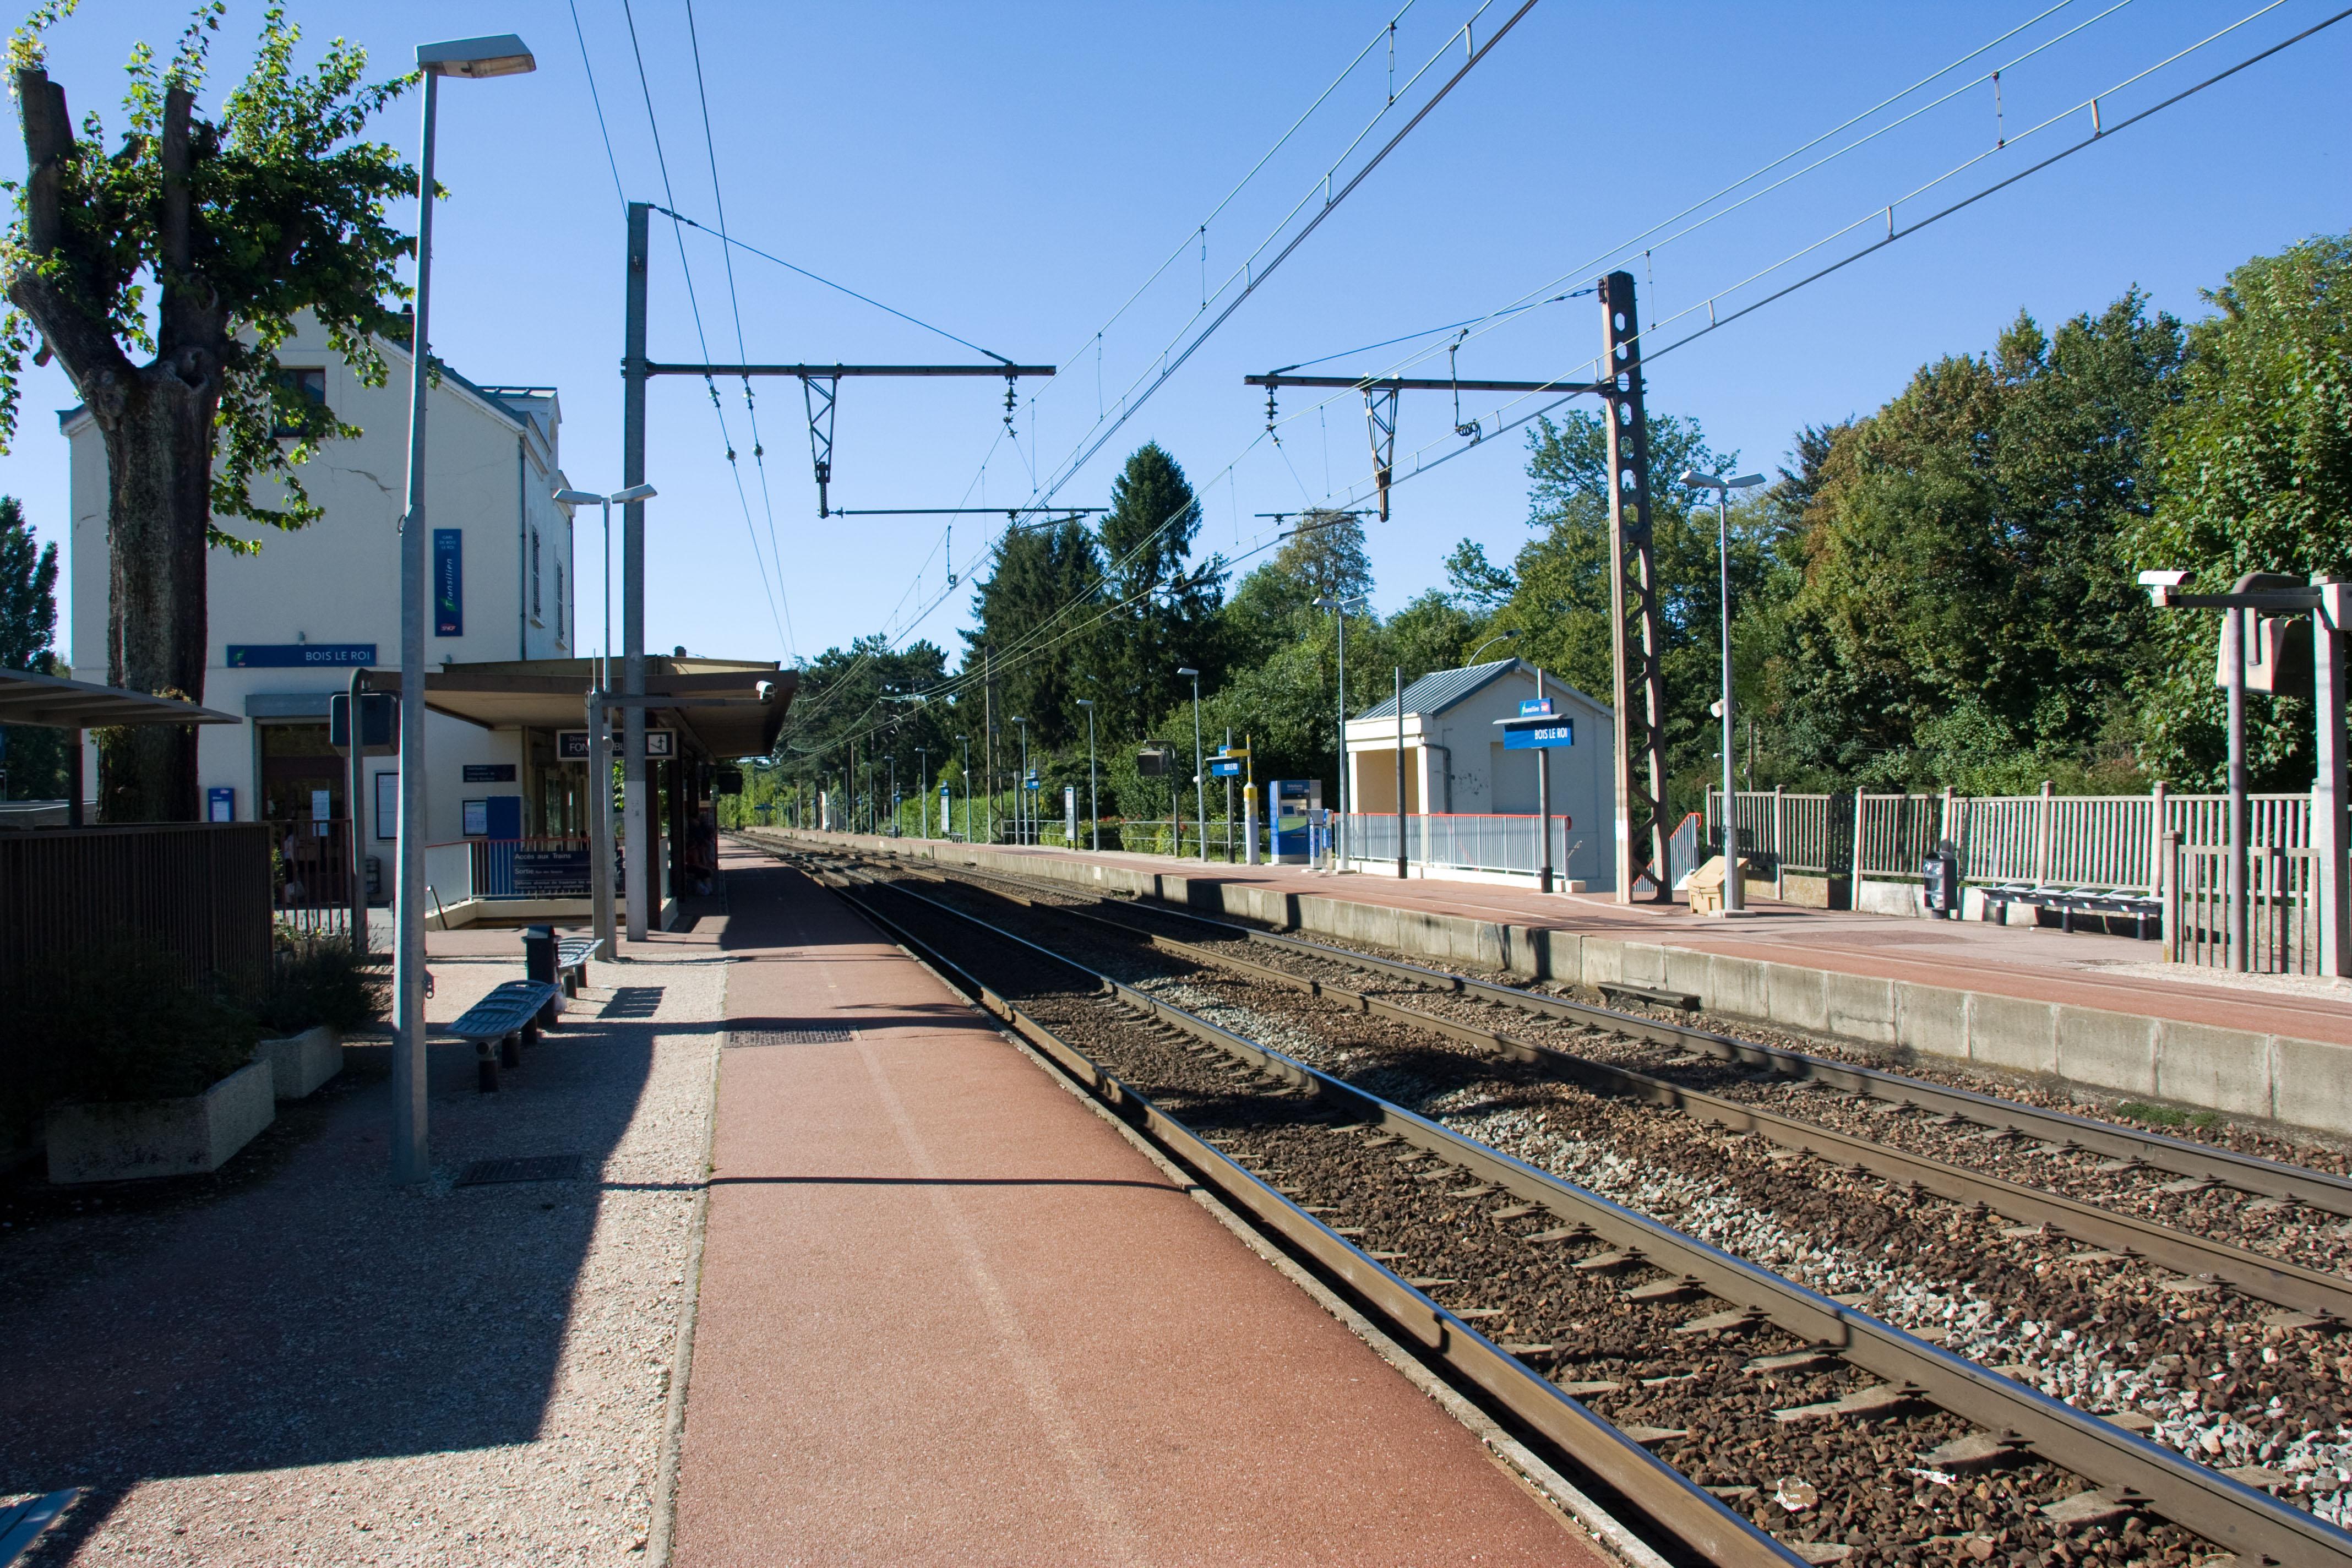 File Gare de Bois le Roi IMG 8430 jpg Wikimedia Commons # Triathlon Bois Le Roi